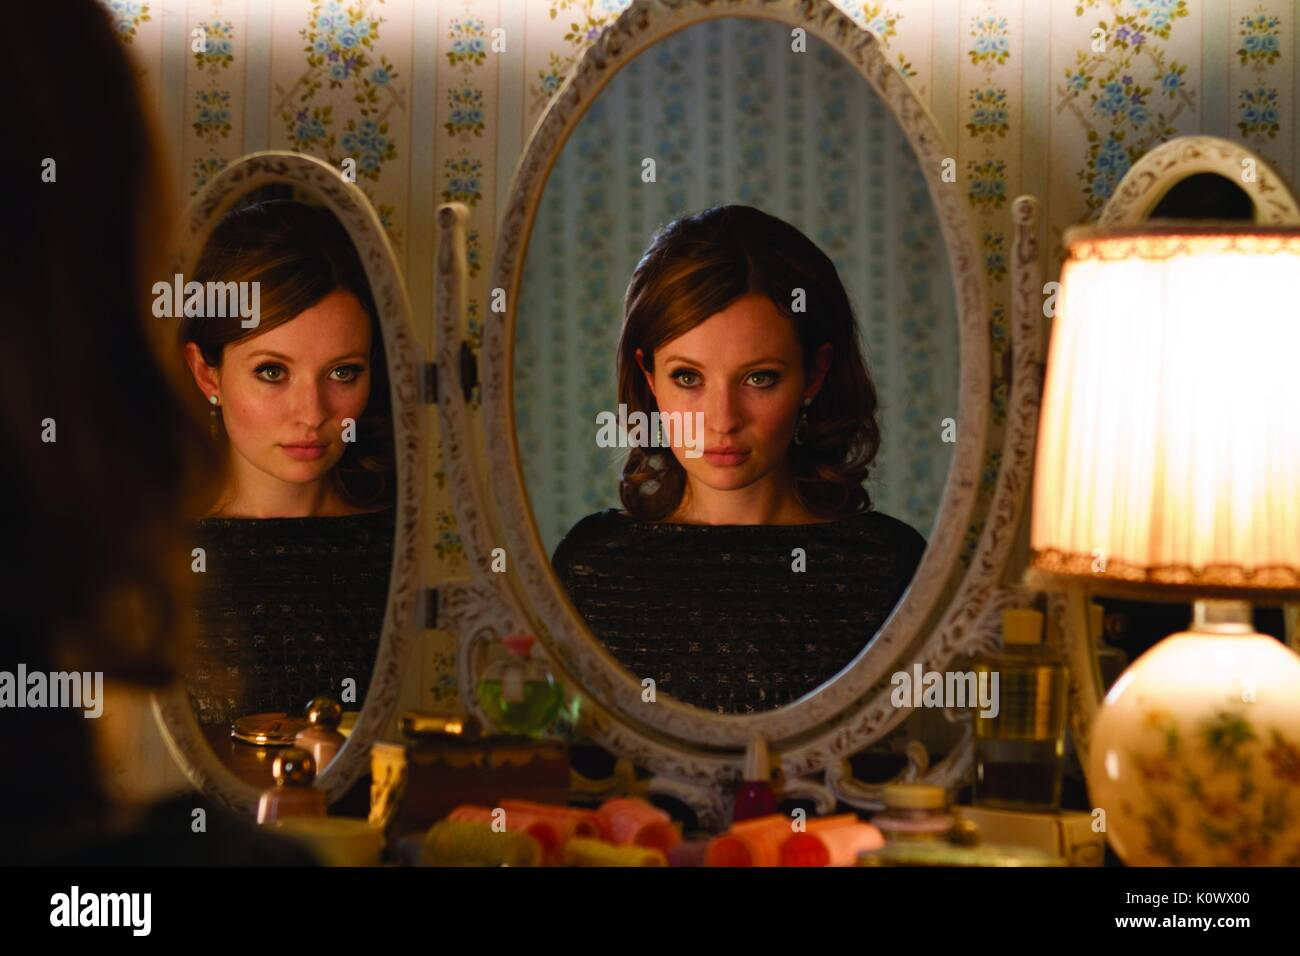 EMILY BROWNING legenda (2015) Immagini Stock